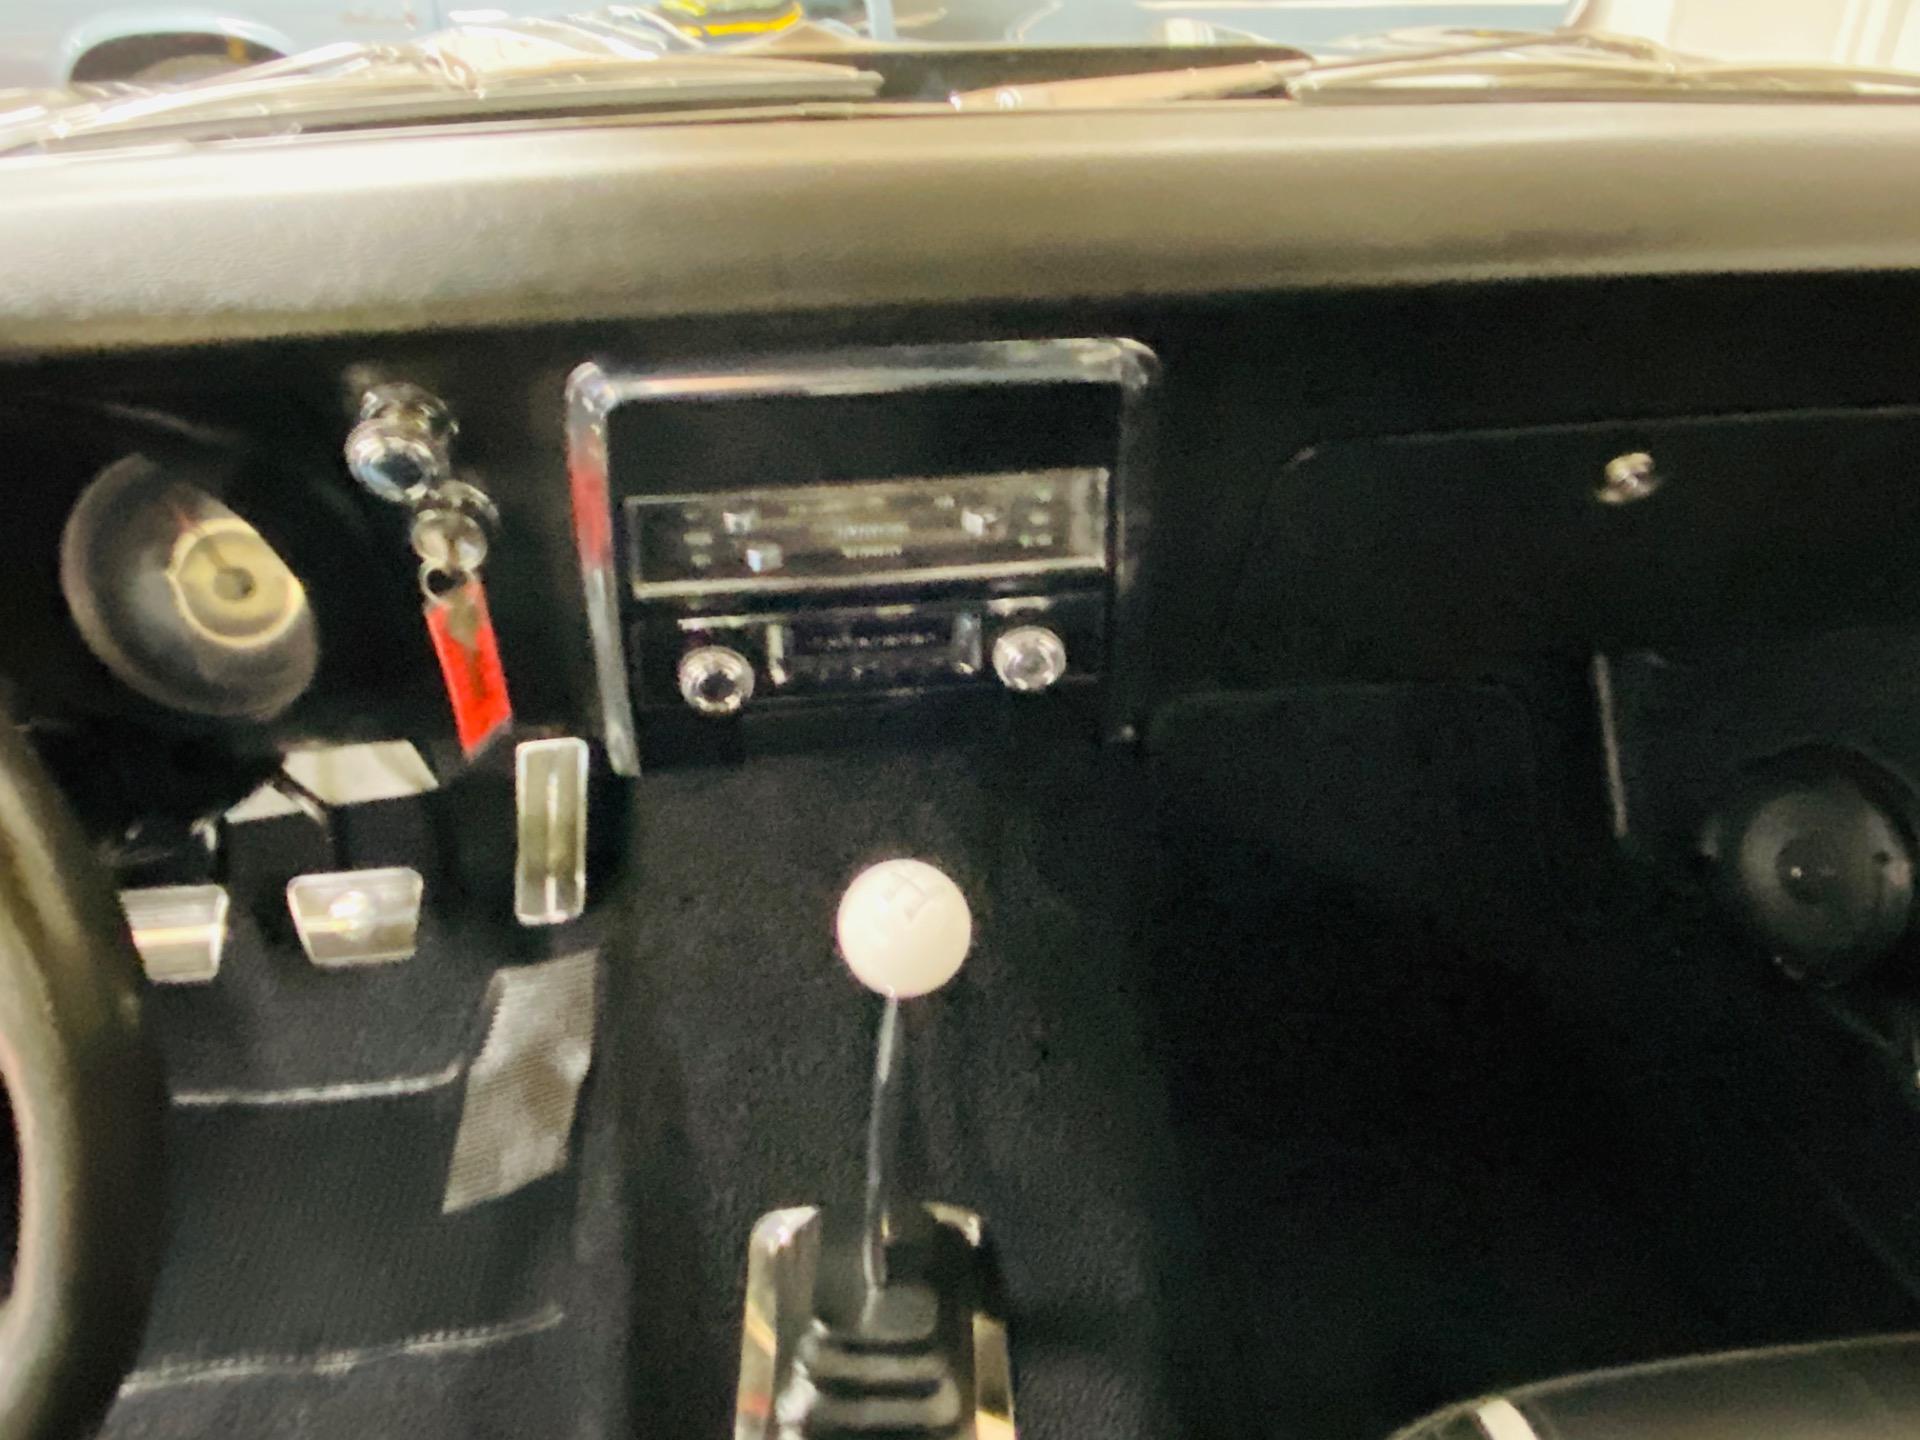 Used 1967 Chevrolet Camaro - 396 BIG BLOCK - 4 SPEED TRANS - FRESH RESTORATION - SEE VIDEO | Mundelein, IL